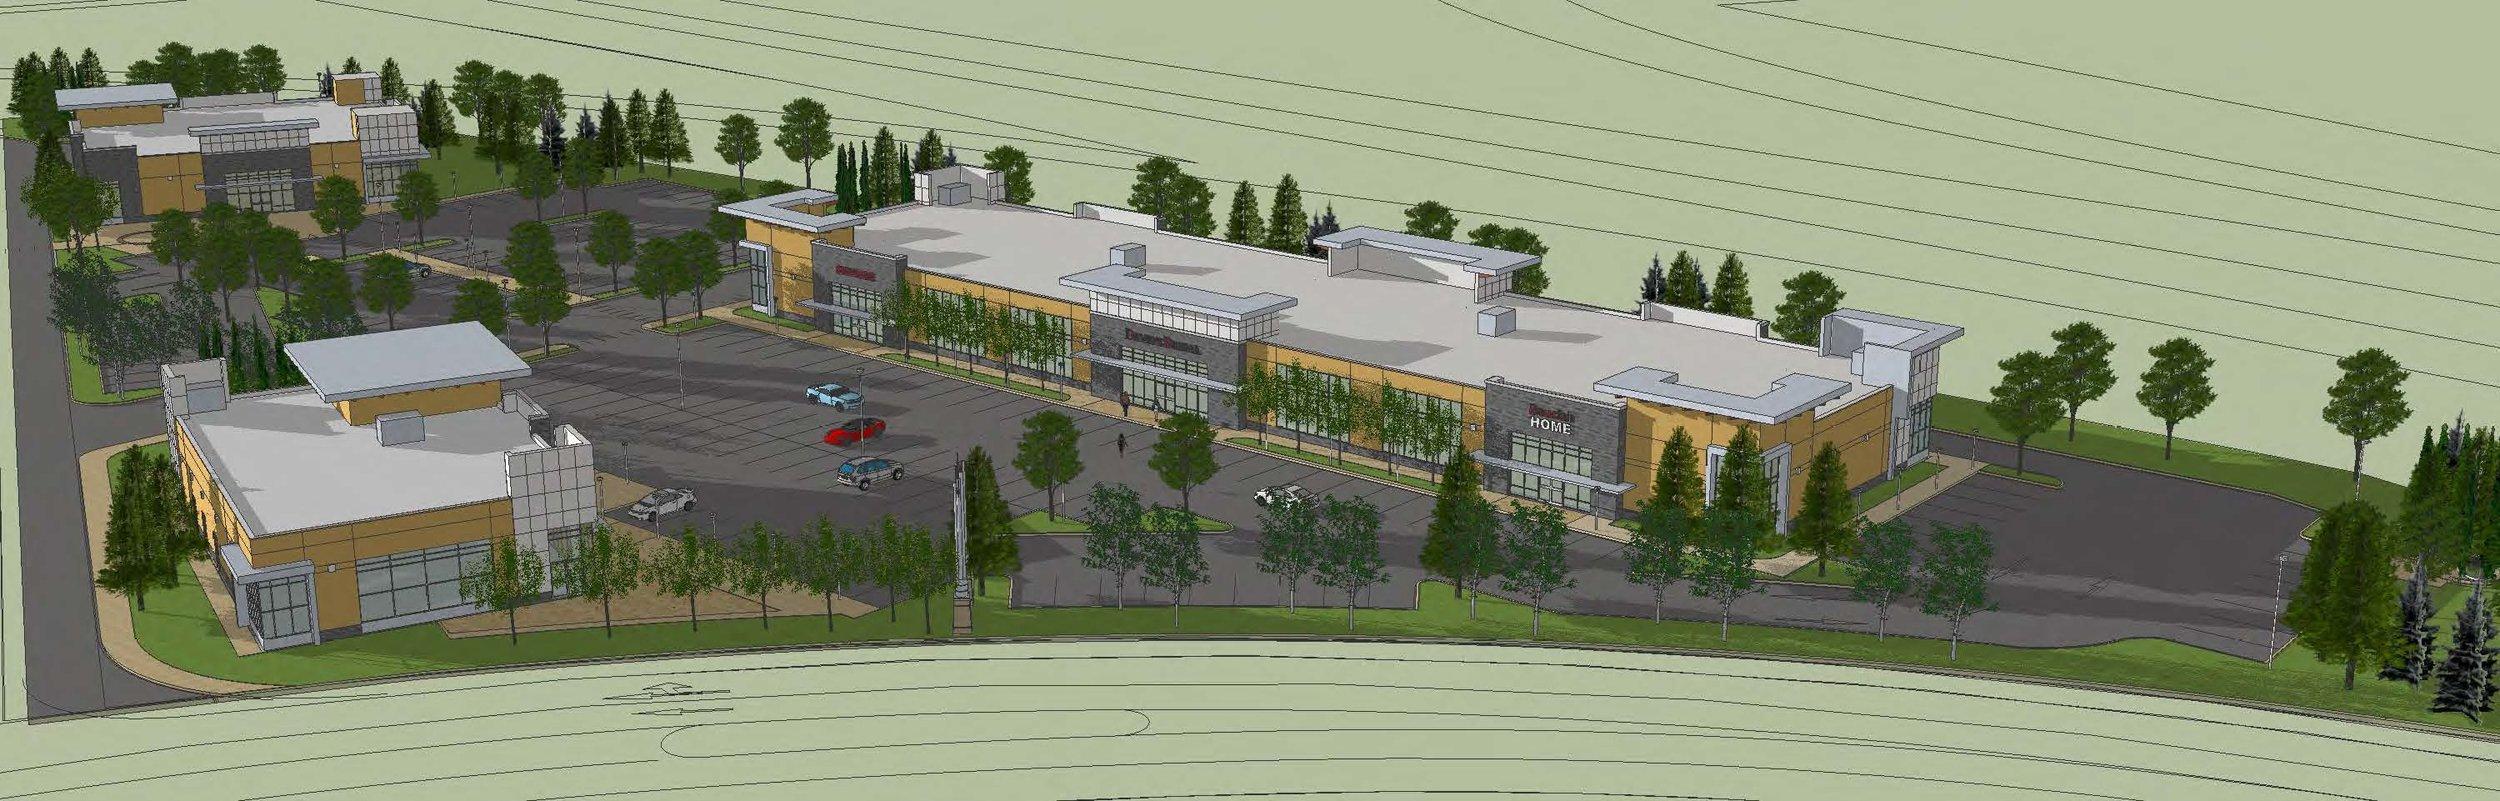 Lifestyle district rendering 2011.jpg